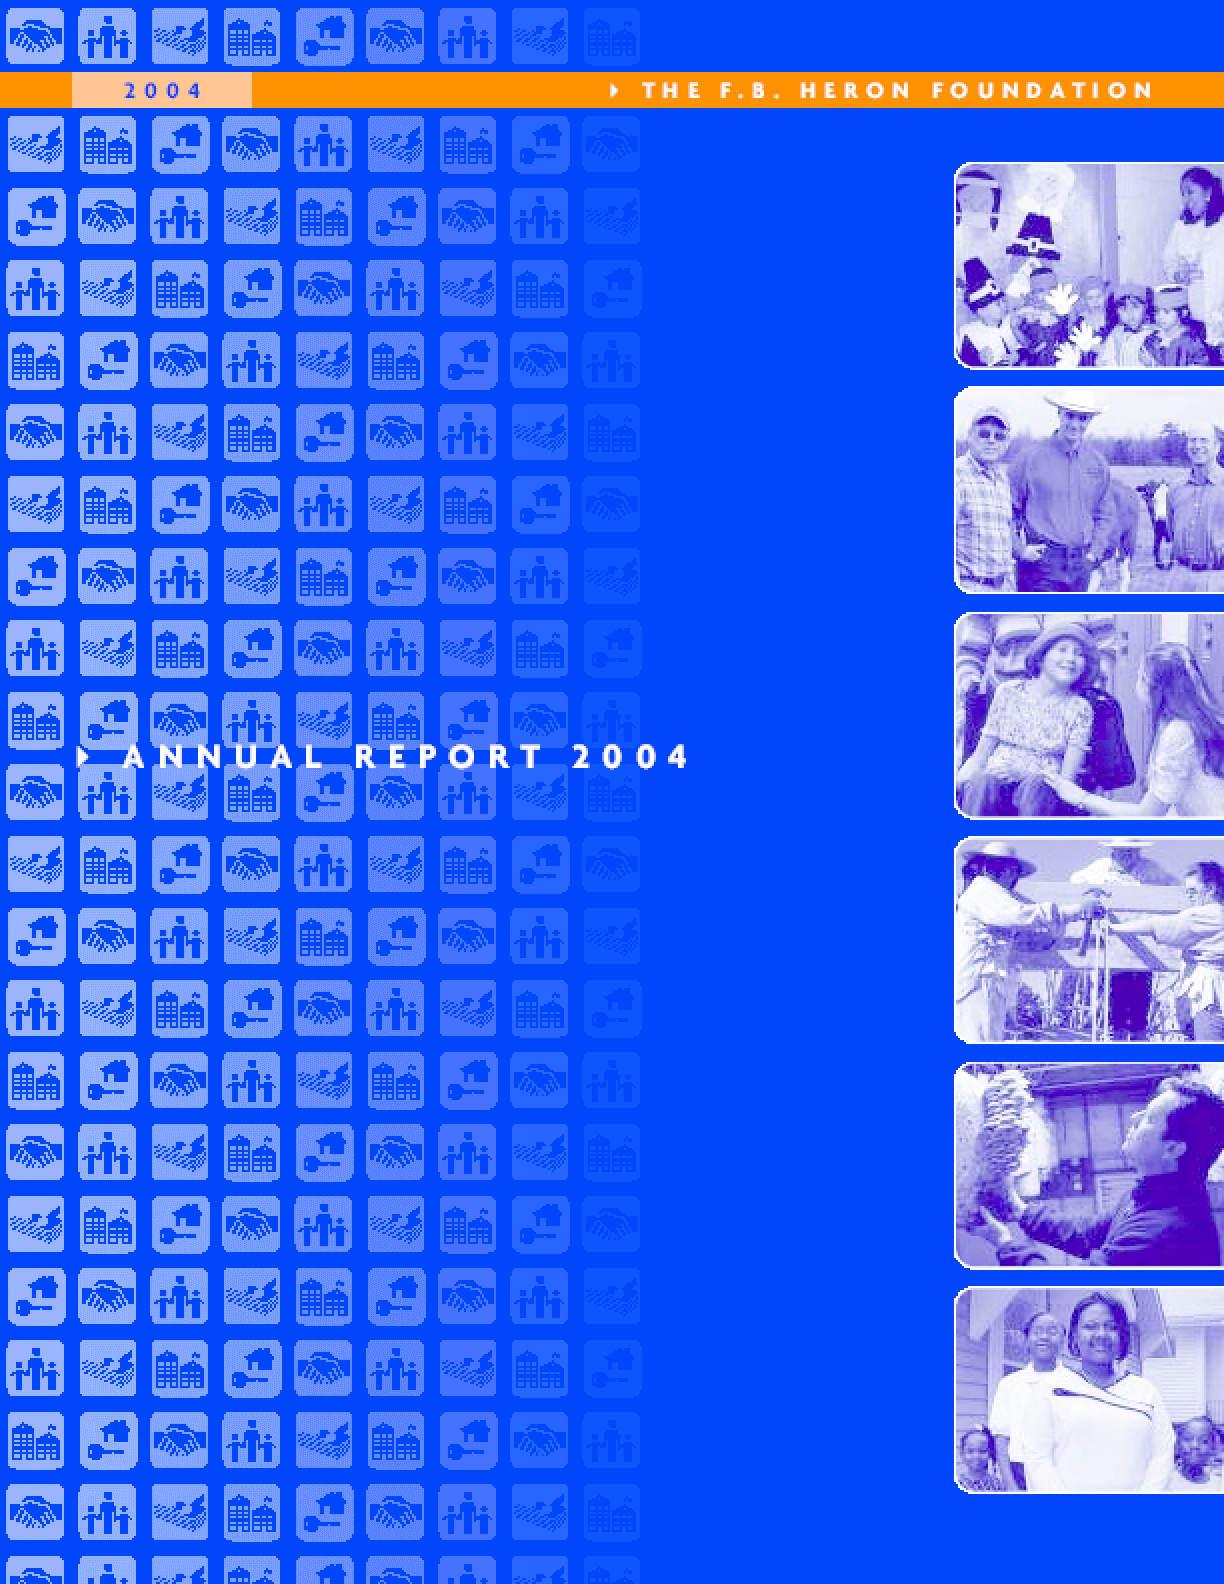 F.B. Heron Foundation Annual Report 2004